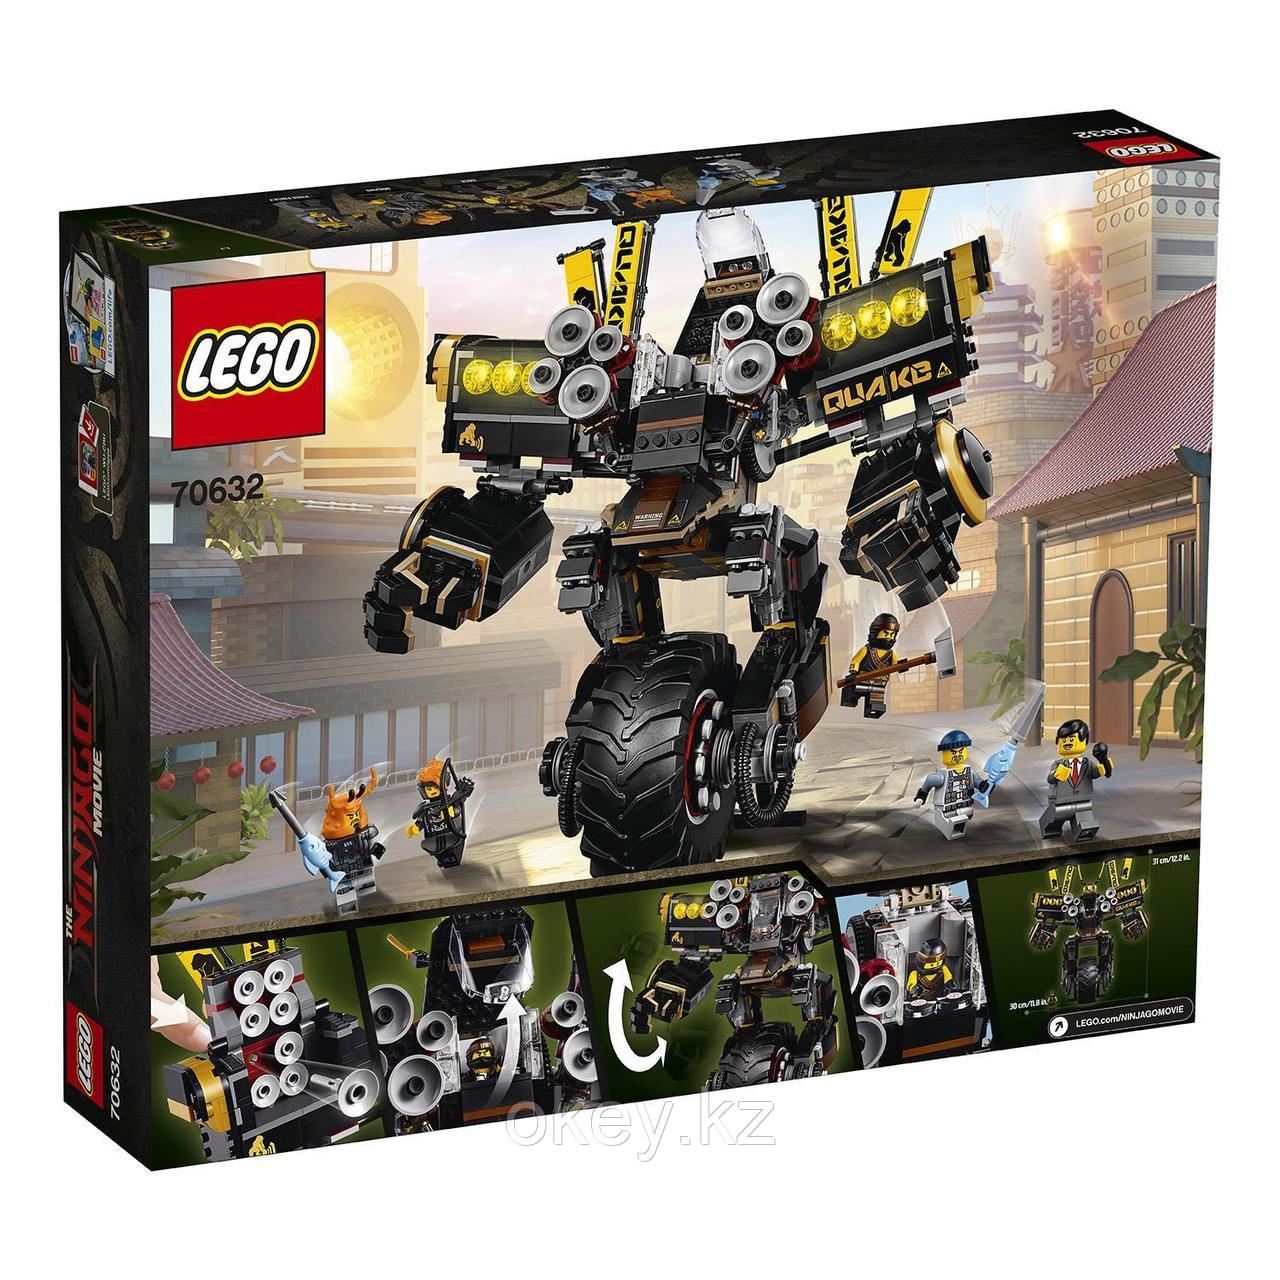 LEGO Ninjago Movie: Робот землетрясений 70632 - фото 4